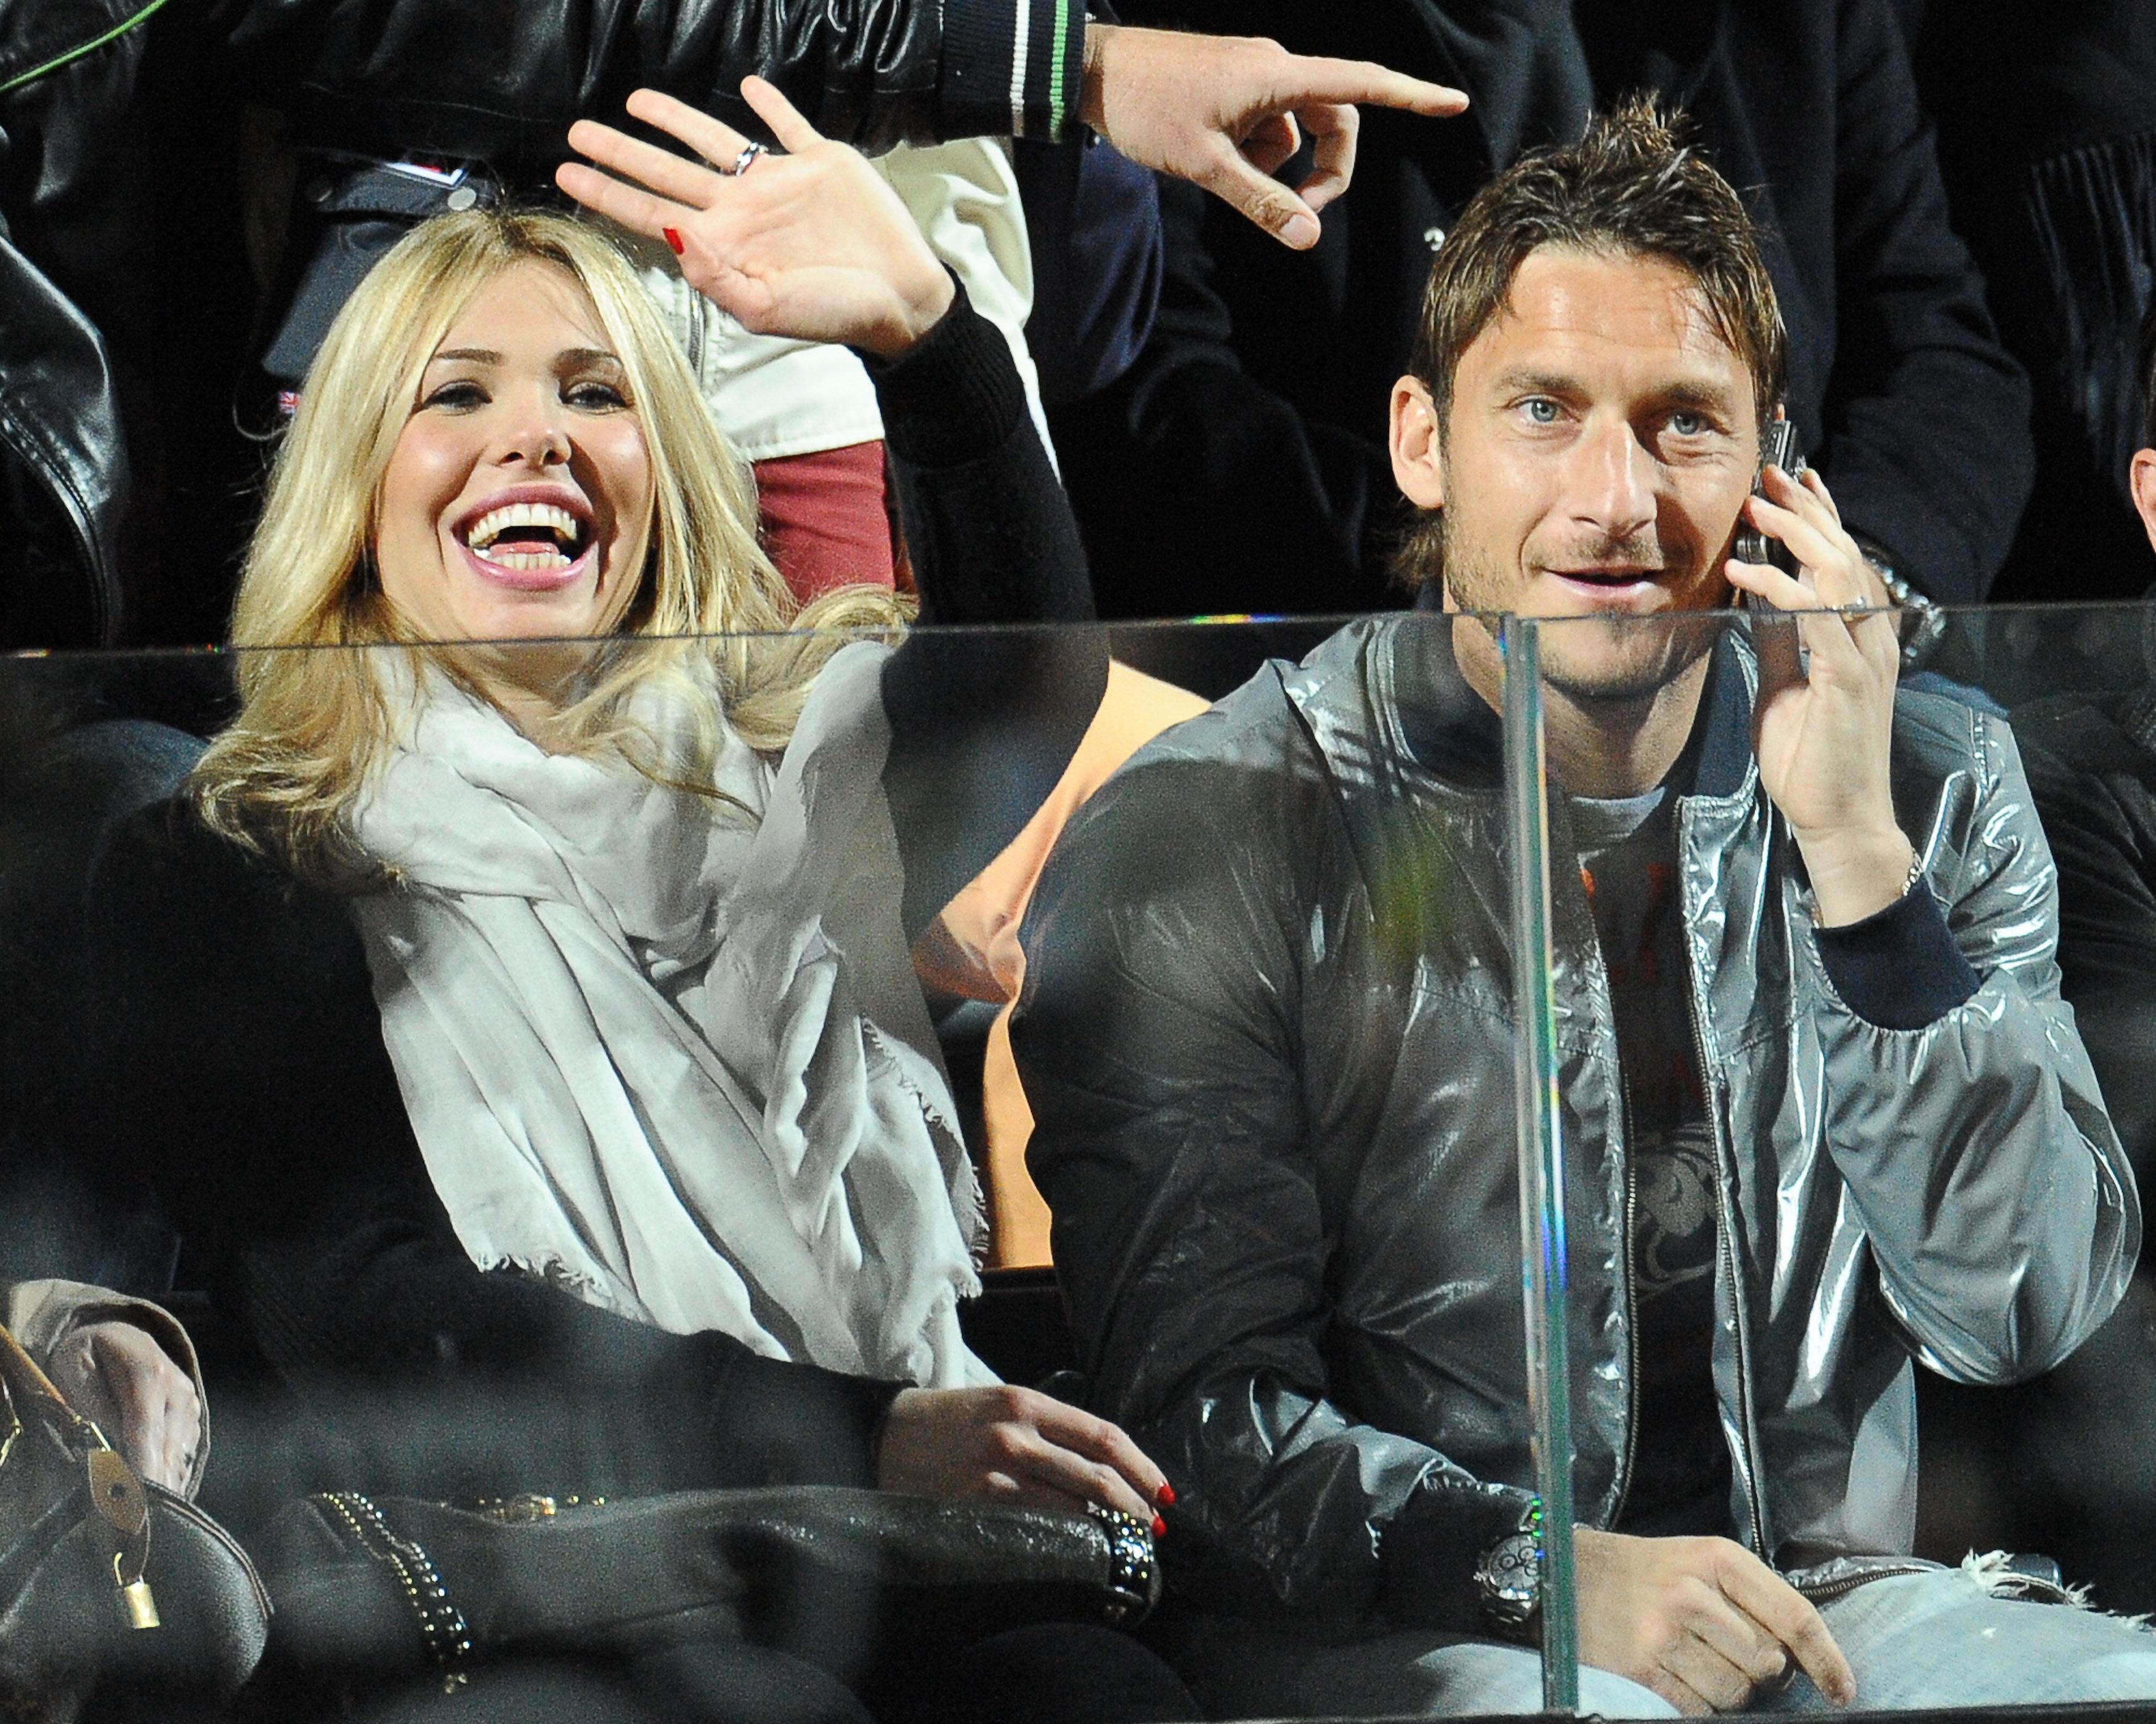 Ilary Blasi, Francesco Totti's Wife